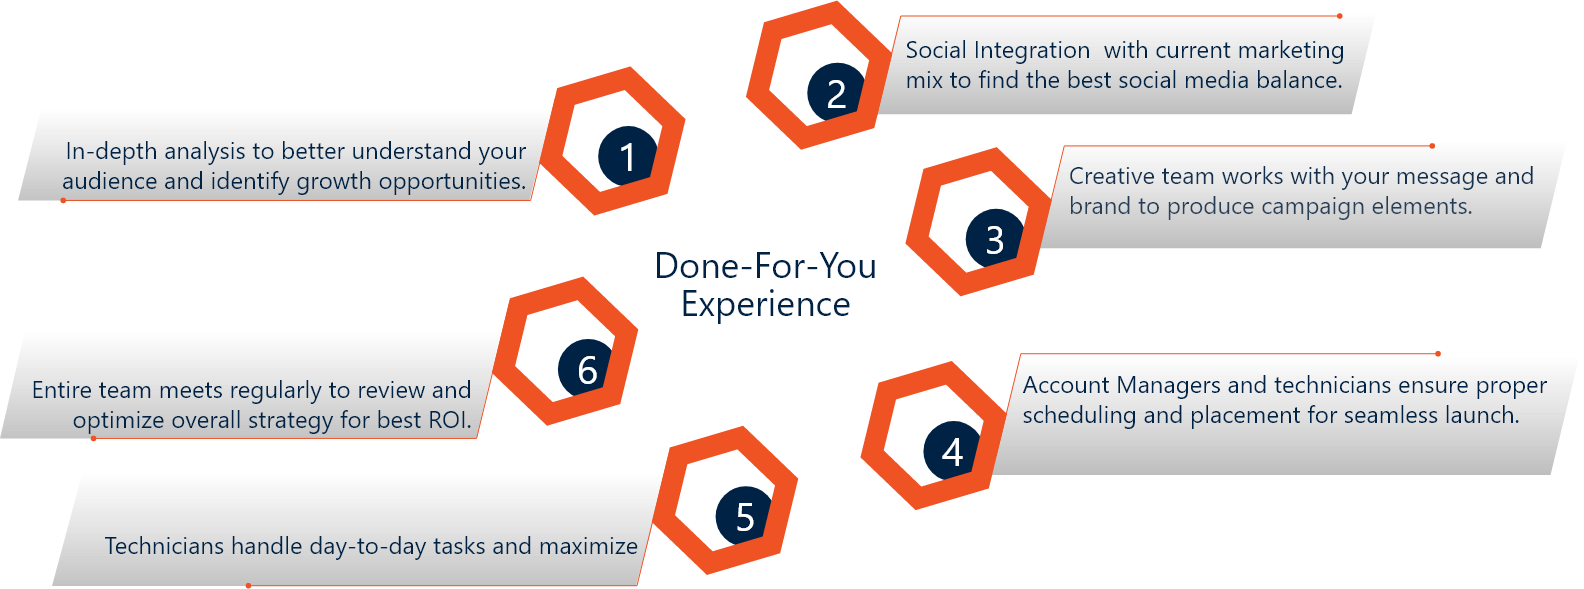 Buzzsocial social media marketing service graphic